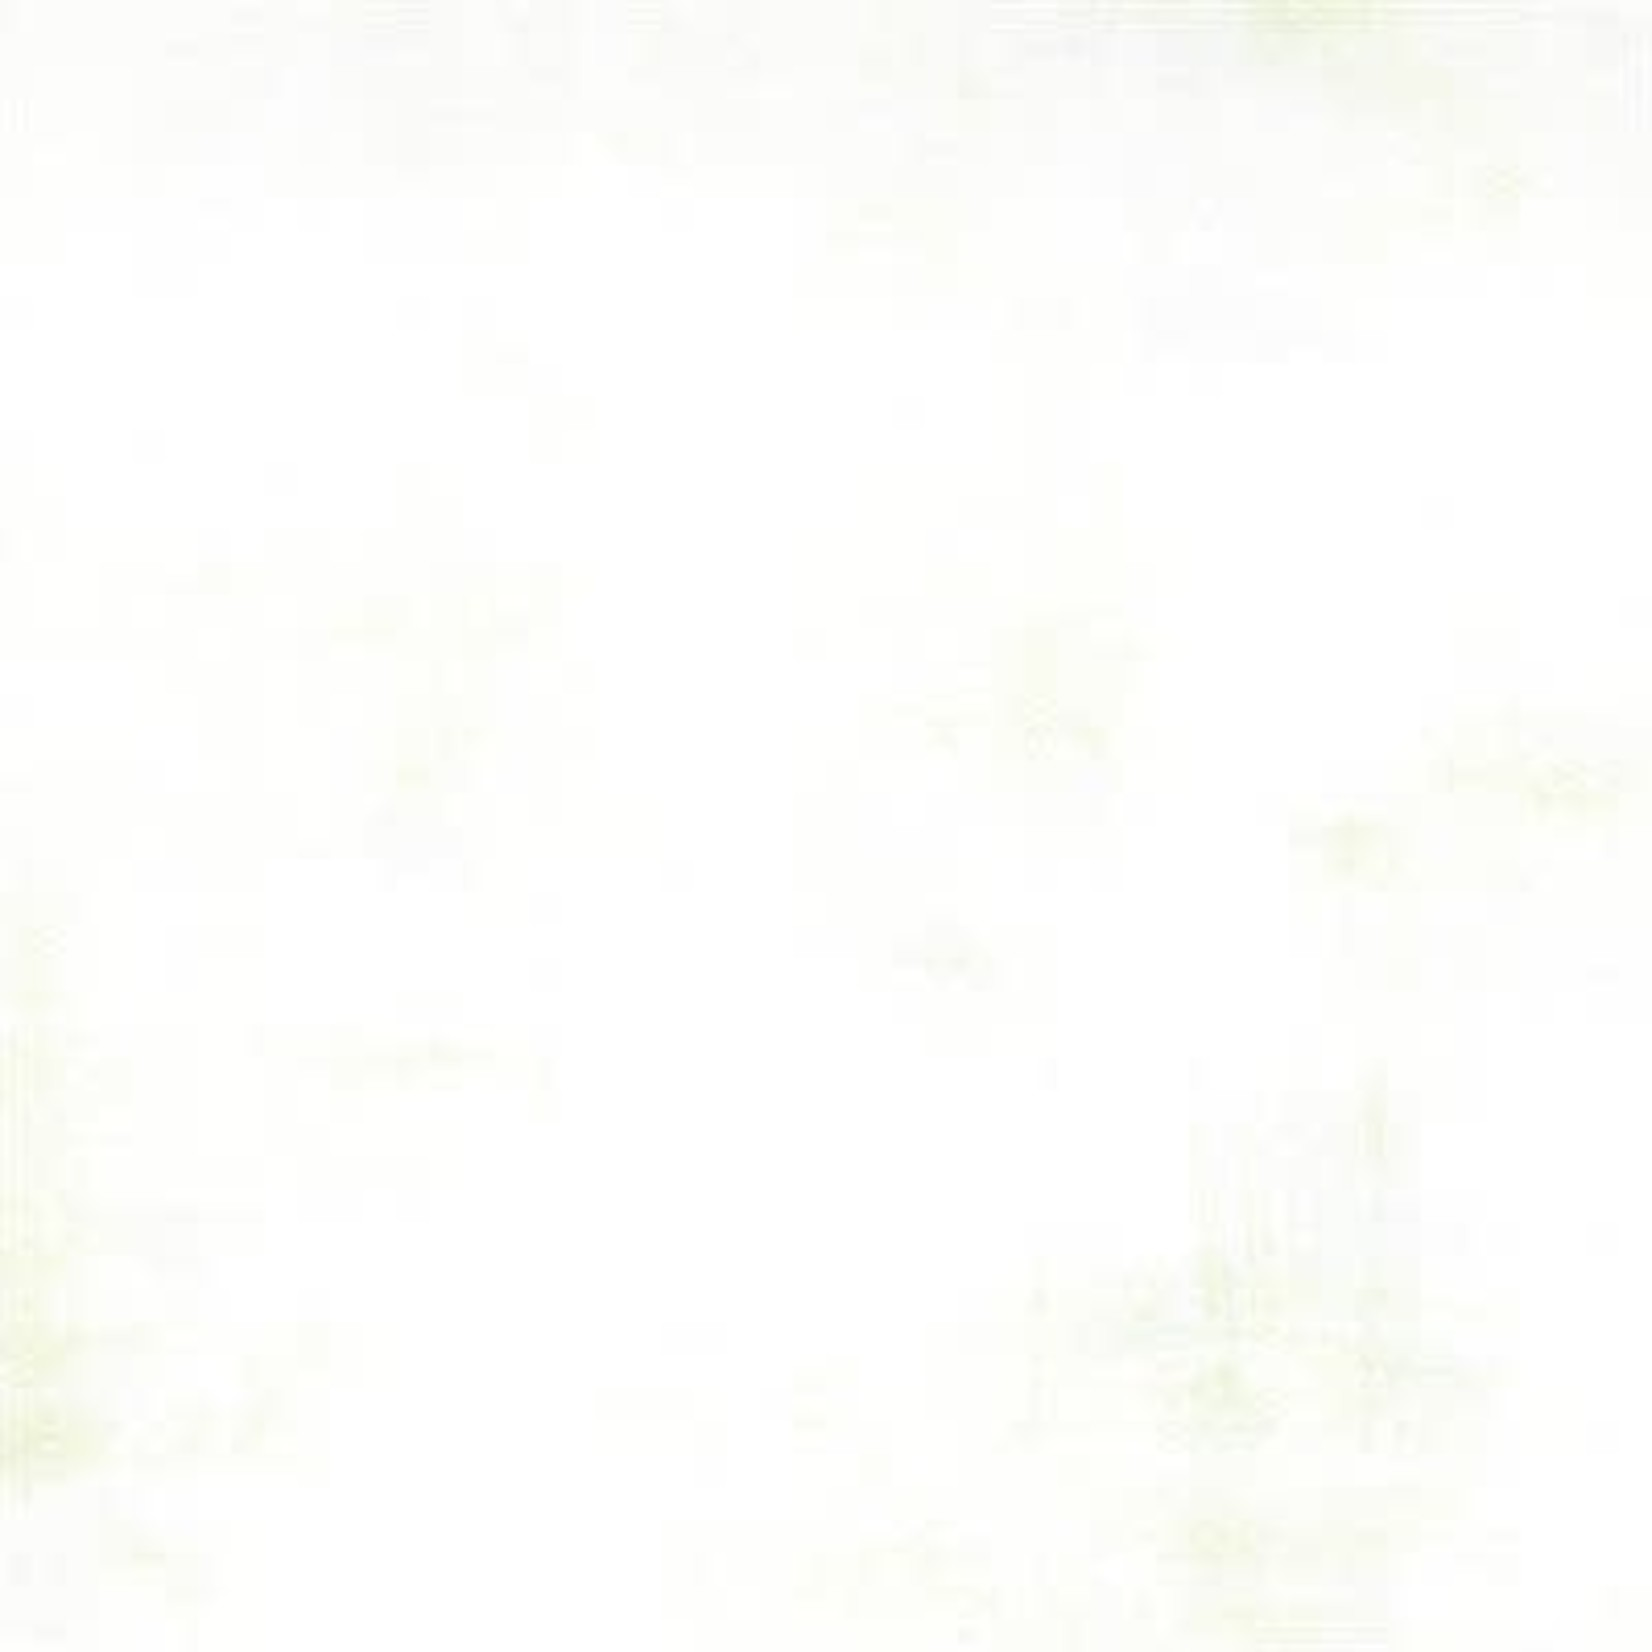 Moda Grunge Basics Grunge - Frosty White per cm or $20/m